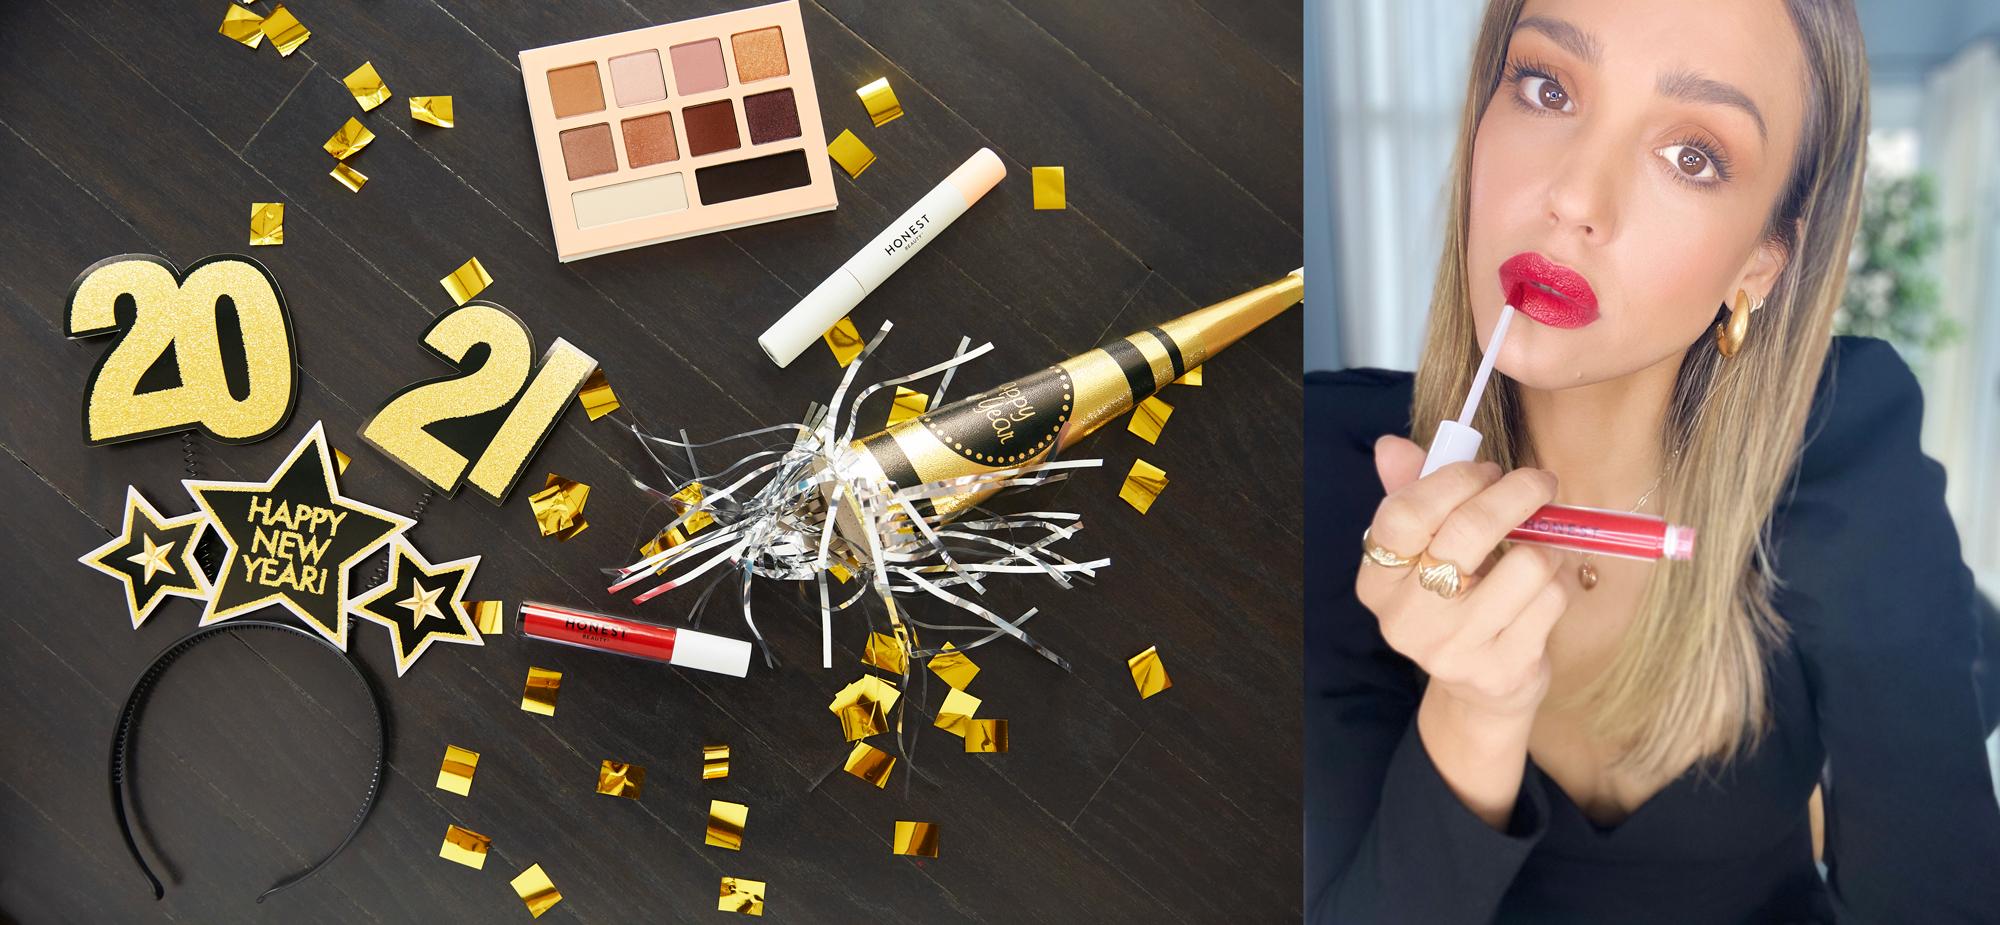 New Years 2021 items and Jessica Alba applying Honest Lipstick